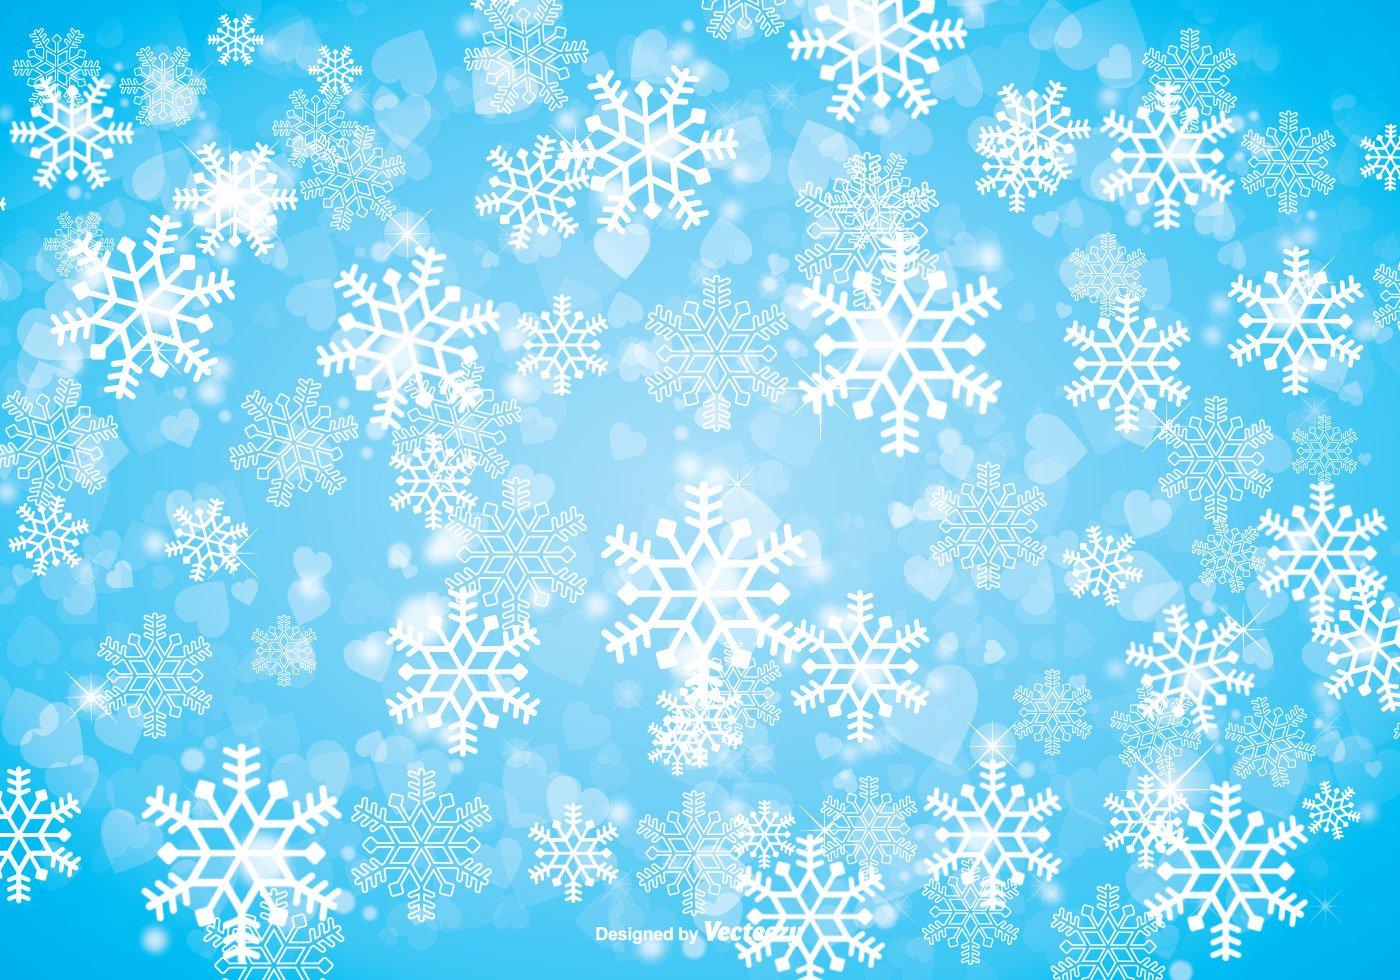 Backgrounds Winter Images - WallpaperPulse